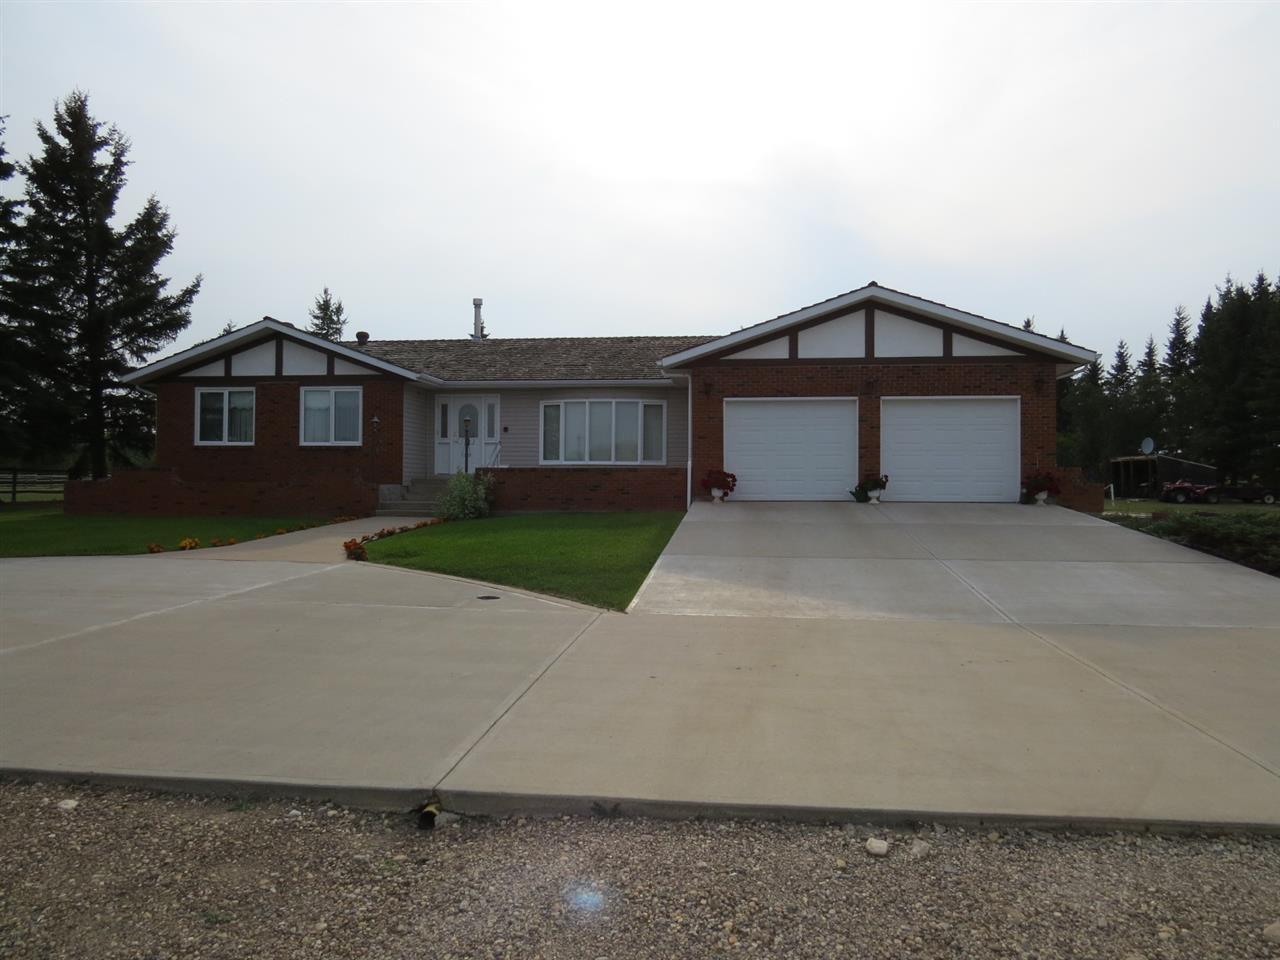 Main Photo: 4526 43 Avenue: Rural Flagstaff County House for sale : MLS®# E4125345